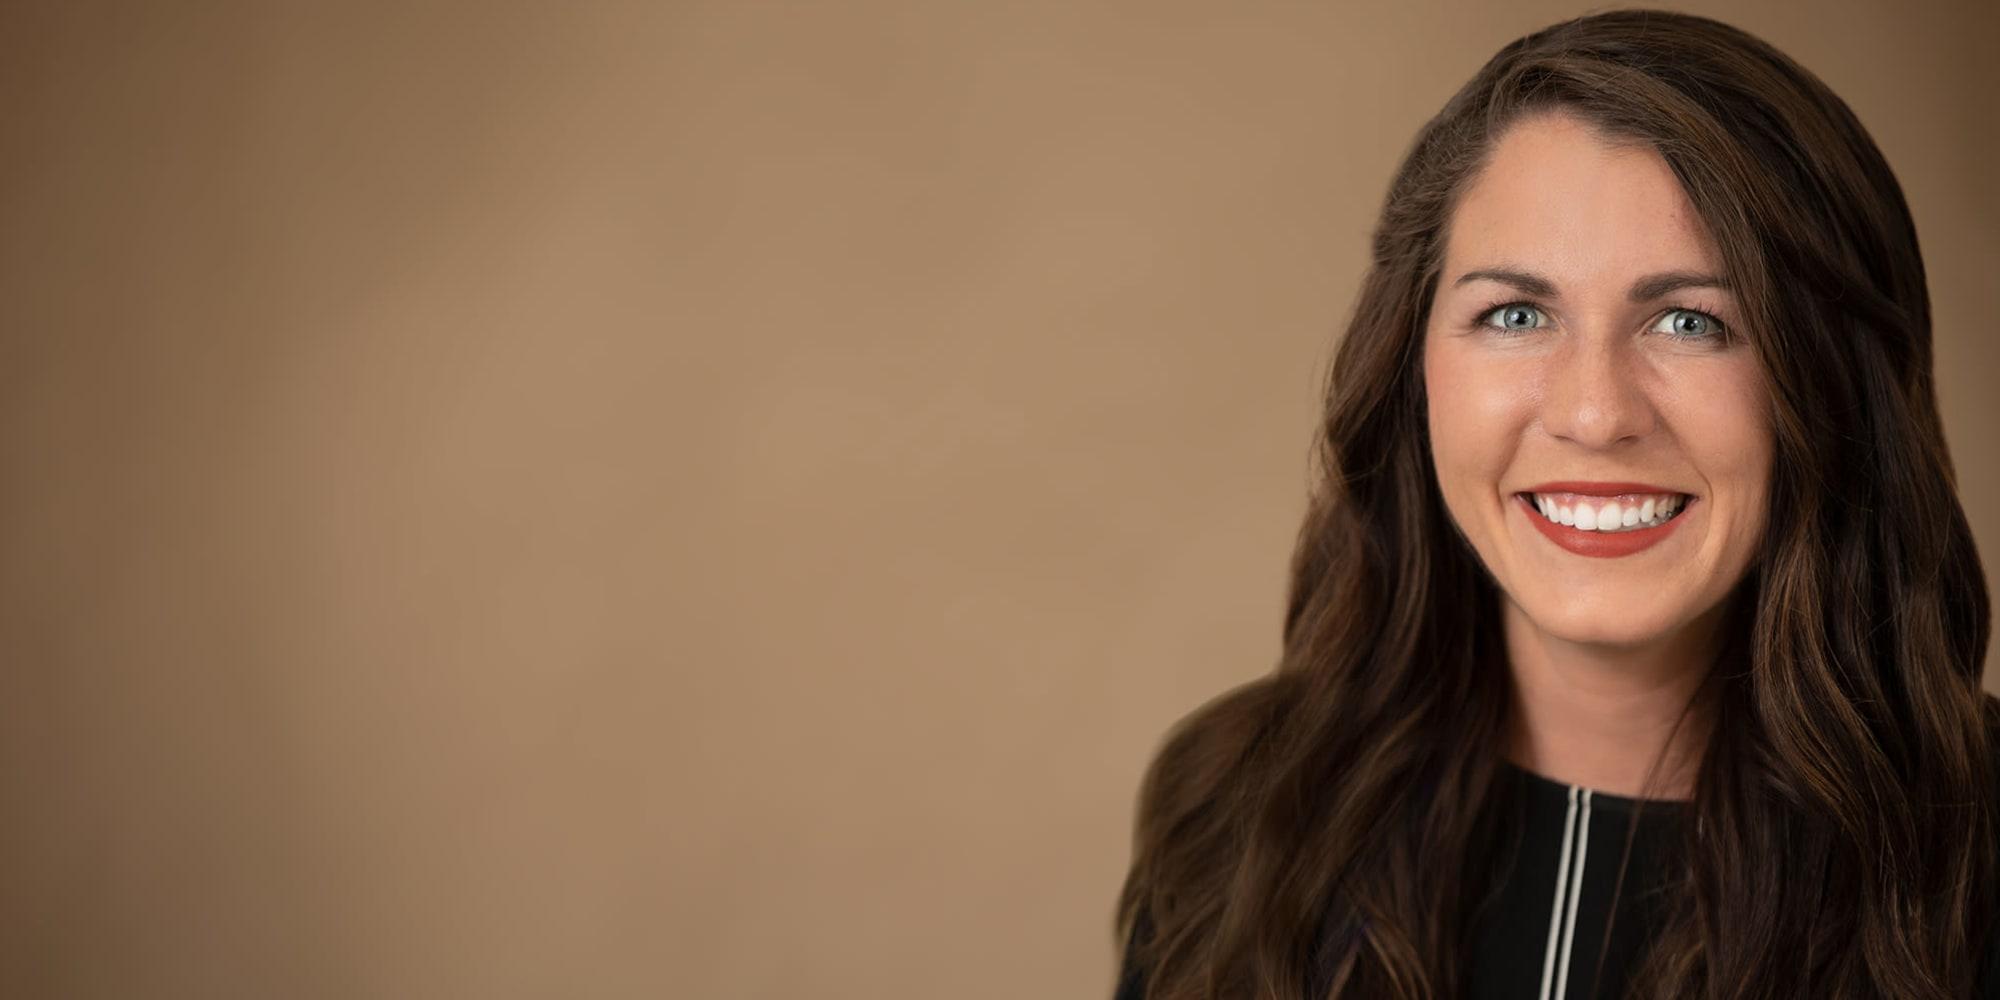 Destiny Sisk, Interim Executive Director at Touchmark on West Century in Bismarck, North Dakota